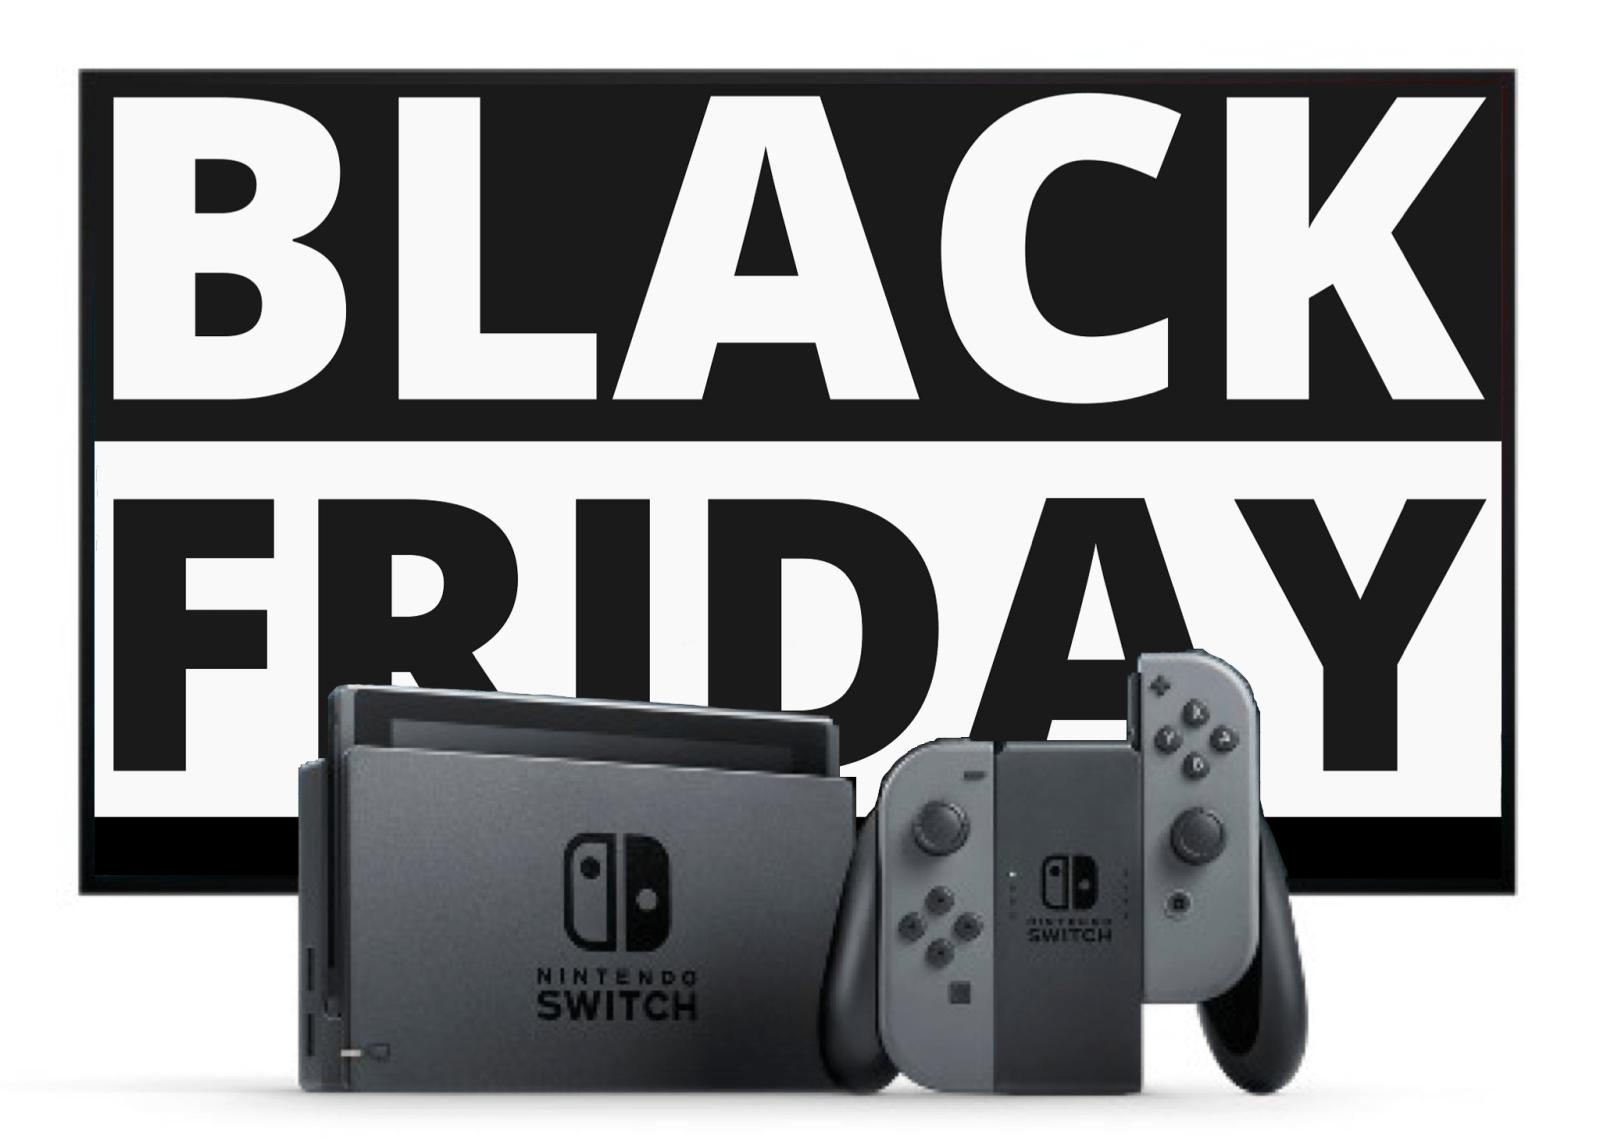 Nintendo Switch Black Friday 2020 Deals Black Friday Sale Offers Nintendo Switch Sales Black Friday Black Friday Ads